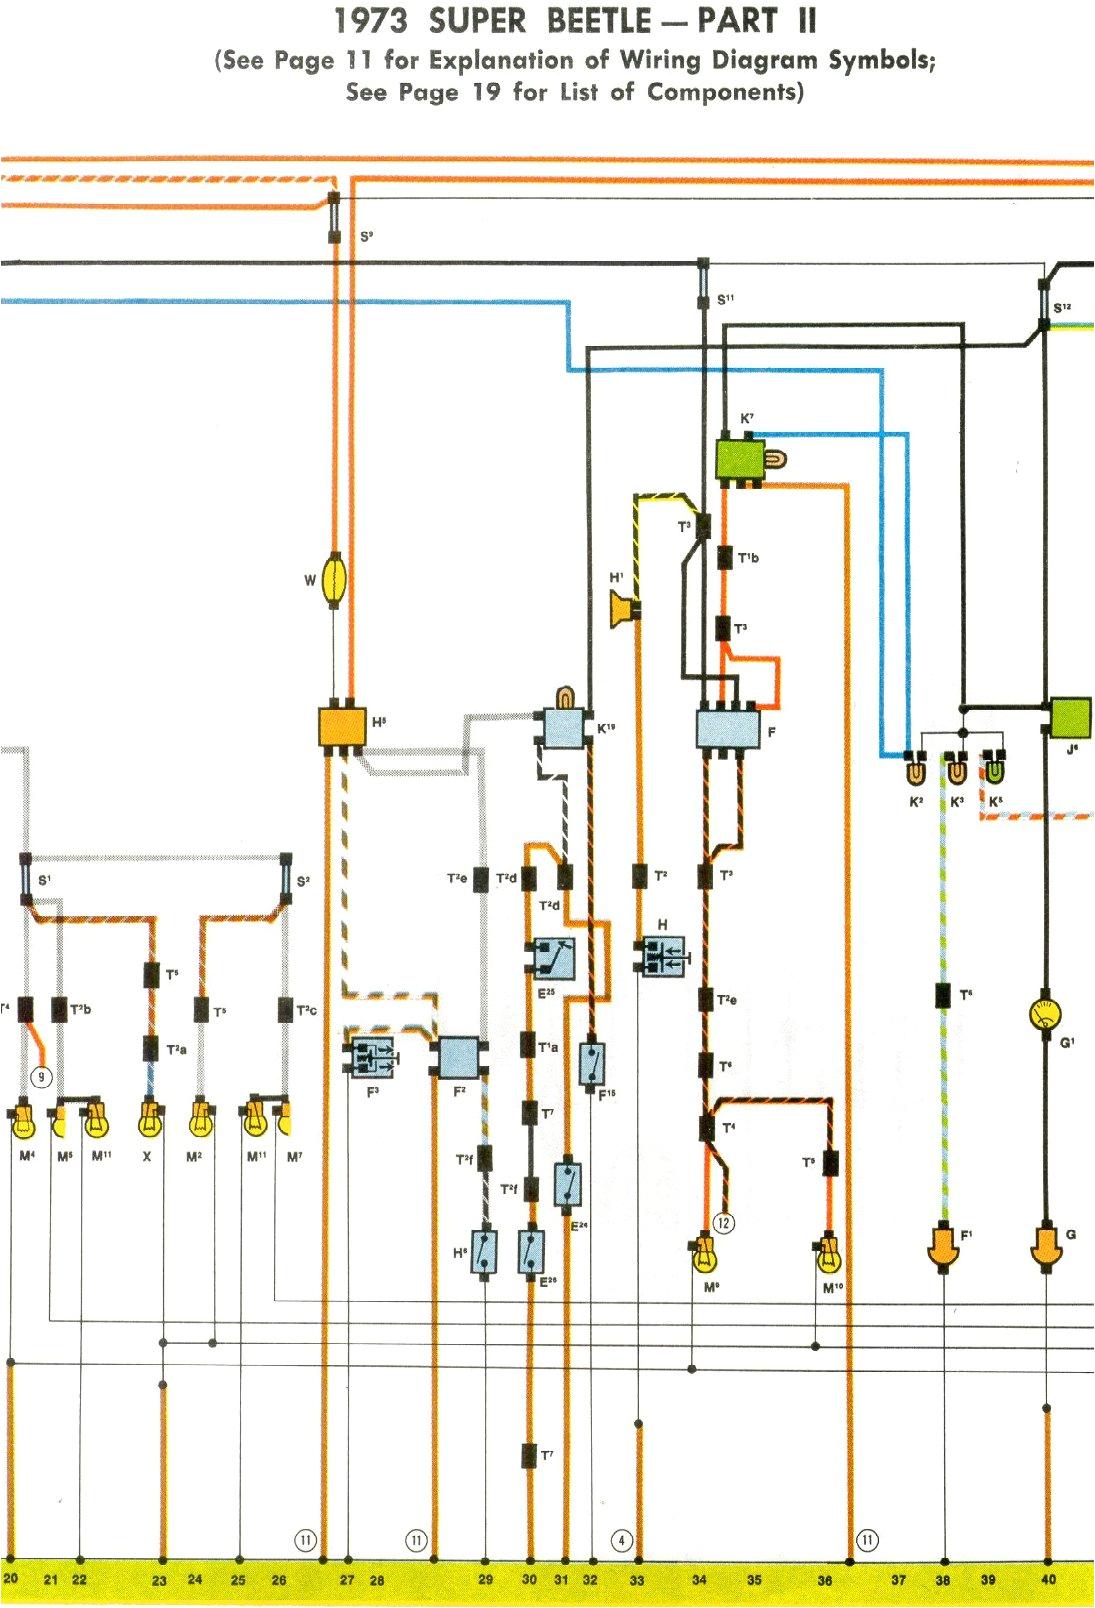 1973 beetle wiring diagram wiring diagram database blog 1973 super beetle wiring diagram thegoldenbug com 1973